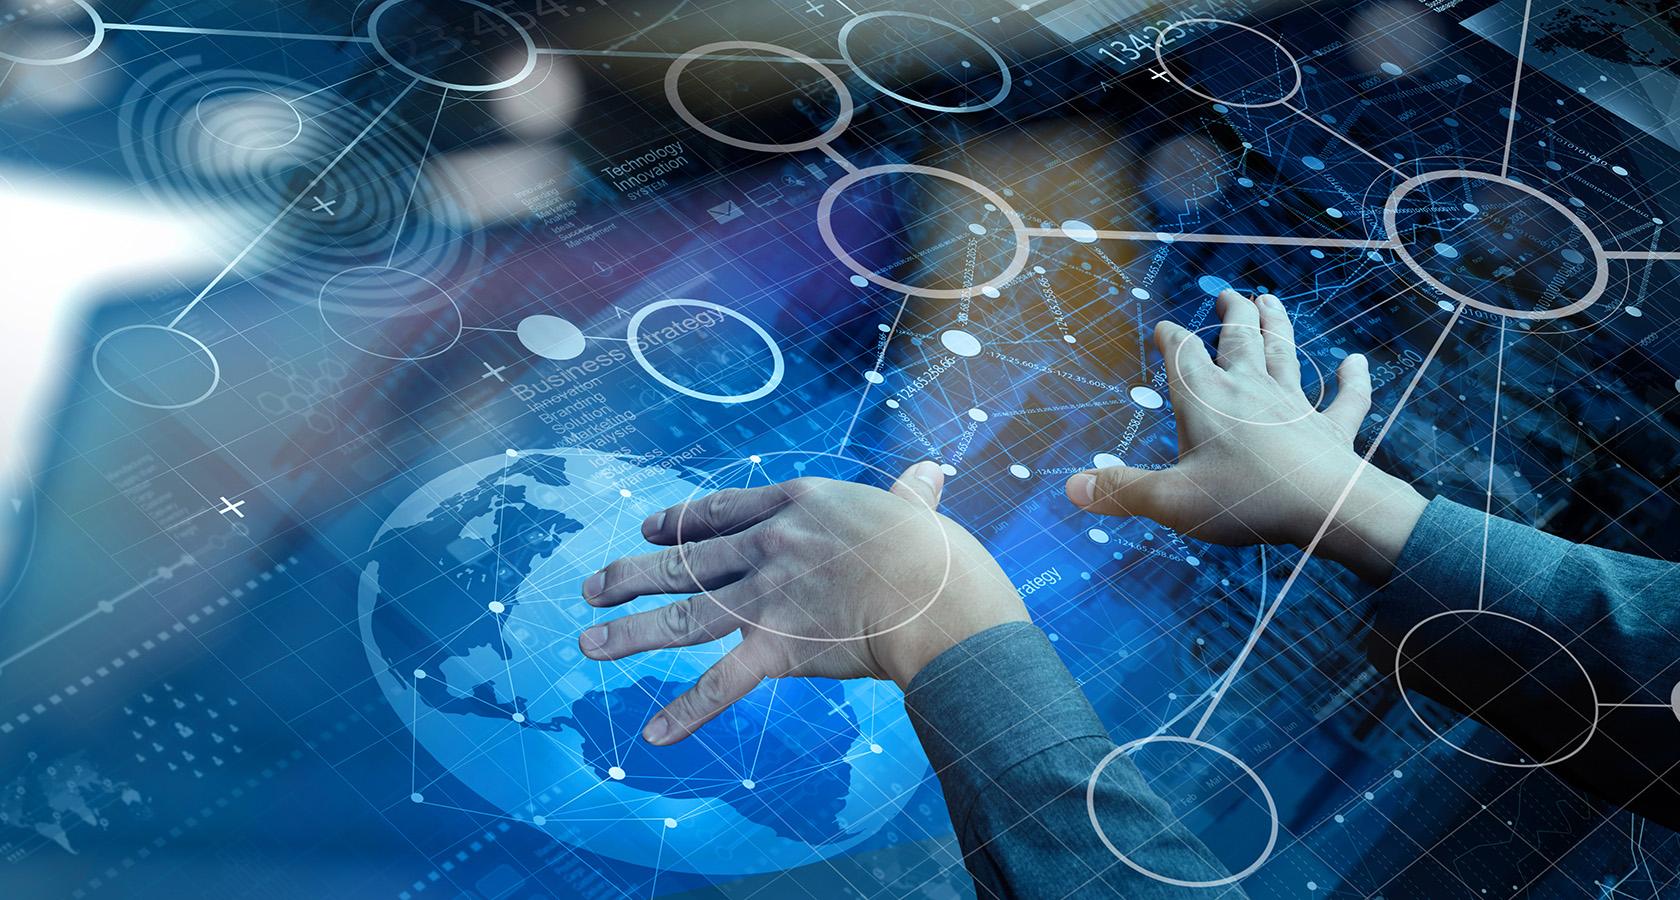 Продай Сбербанку свою технологию по аналитике BigData | Rusbase